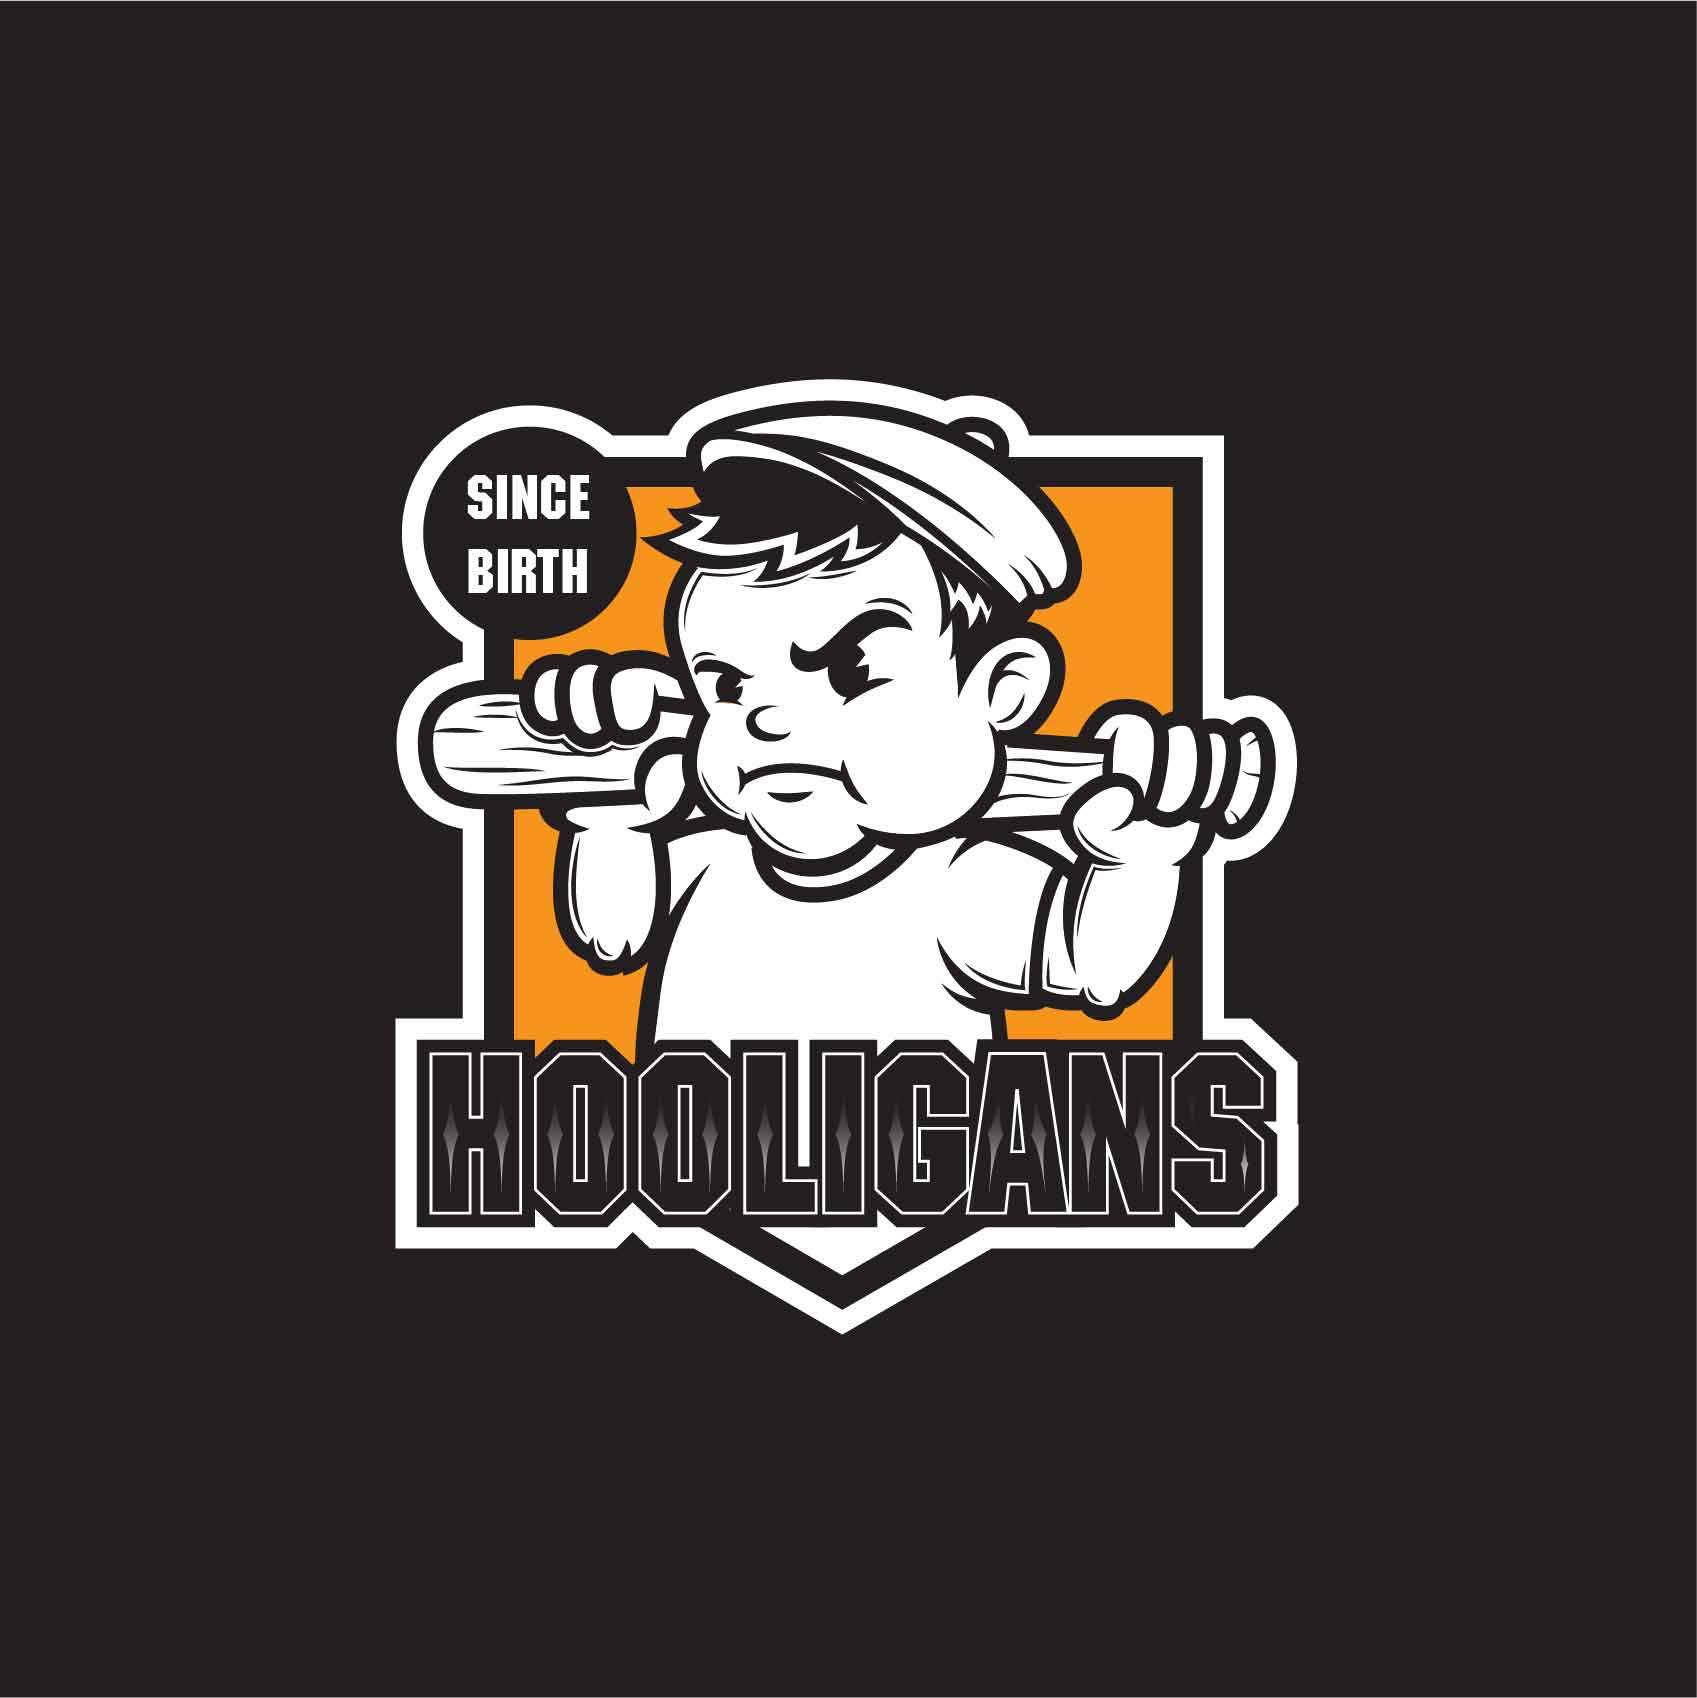 Hooligans in 2019.